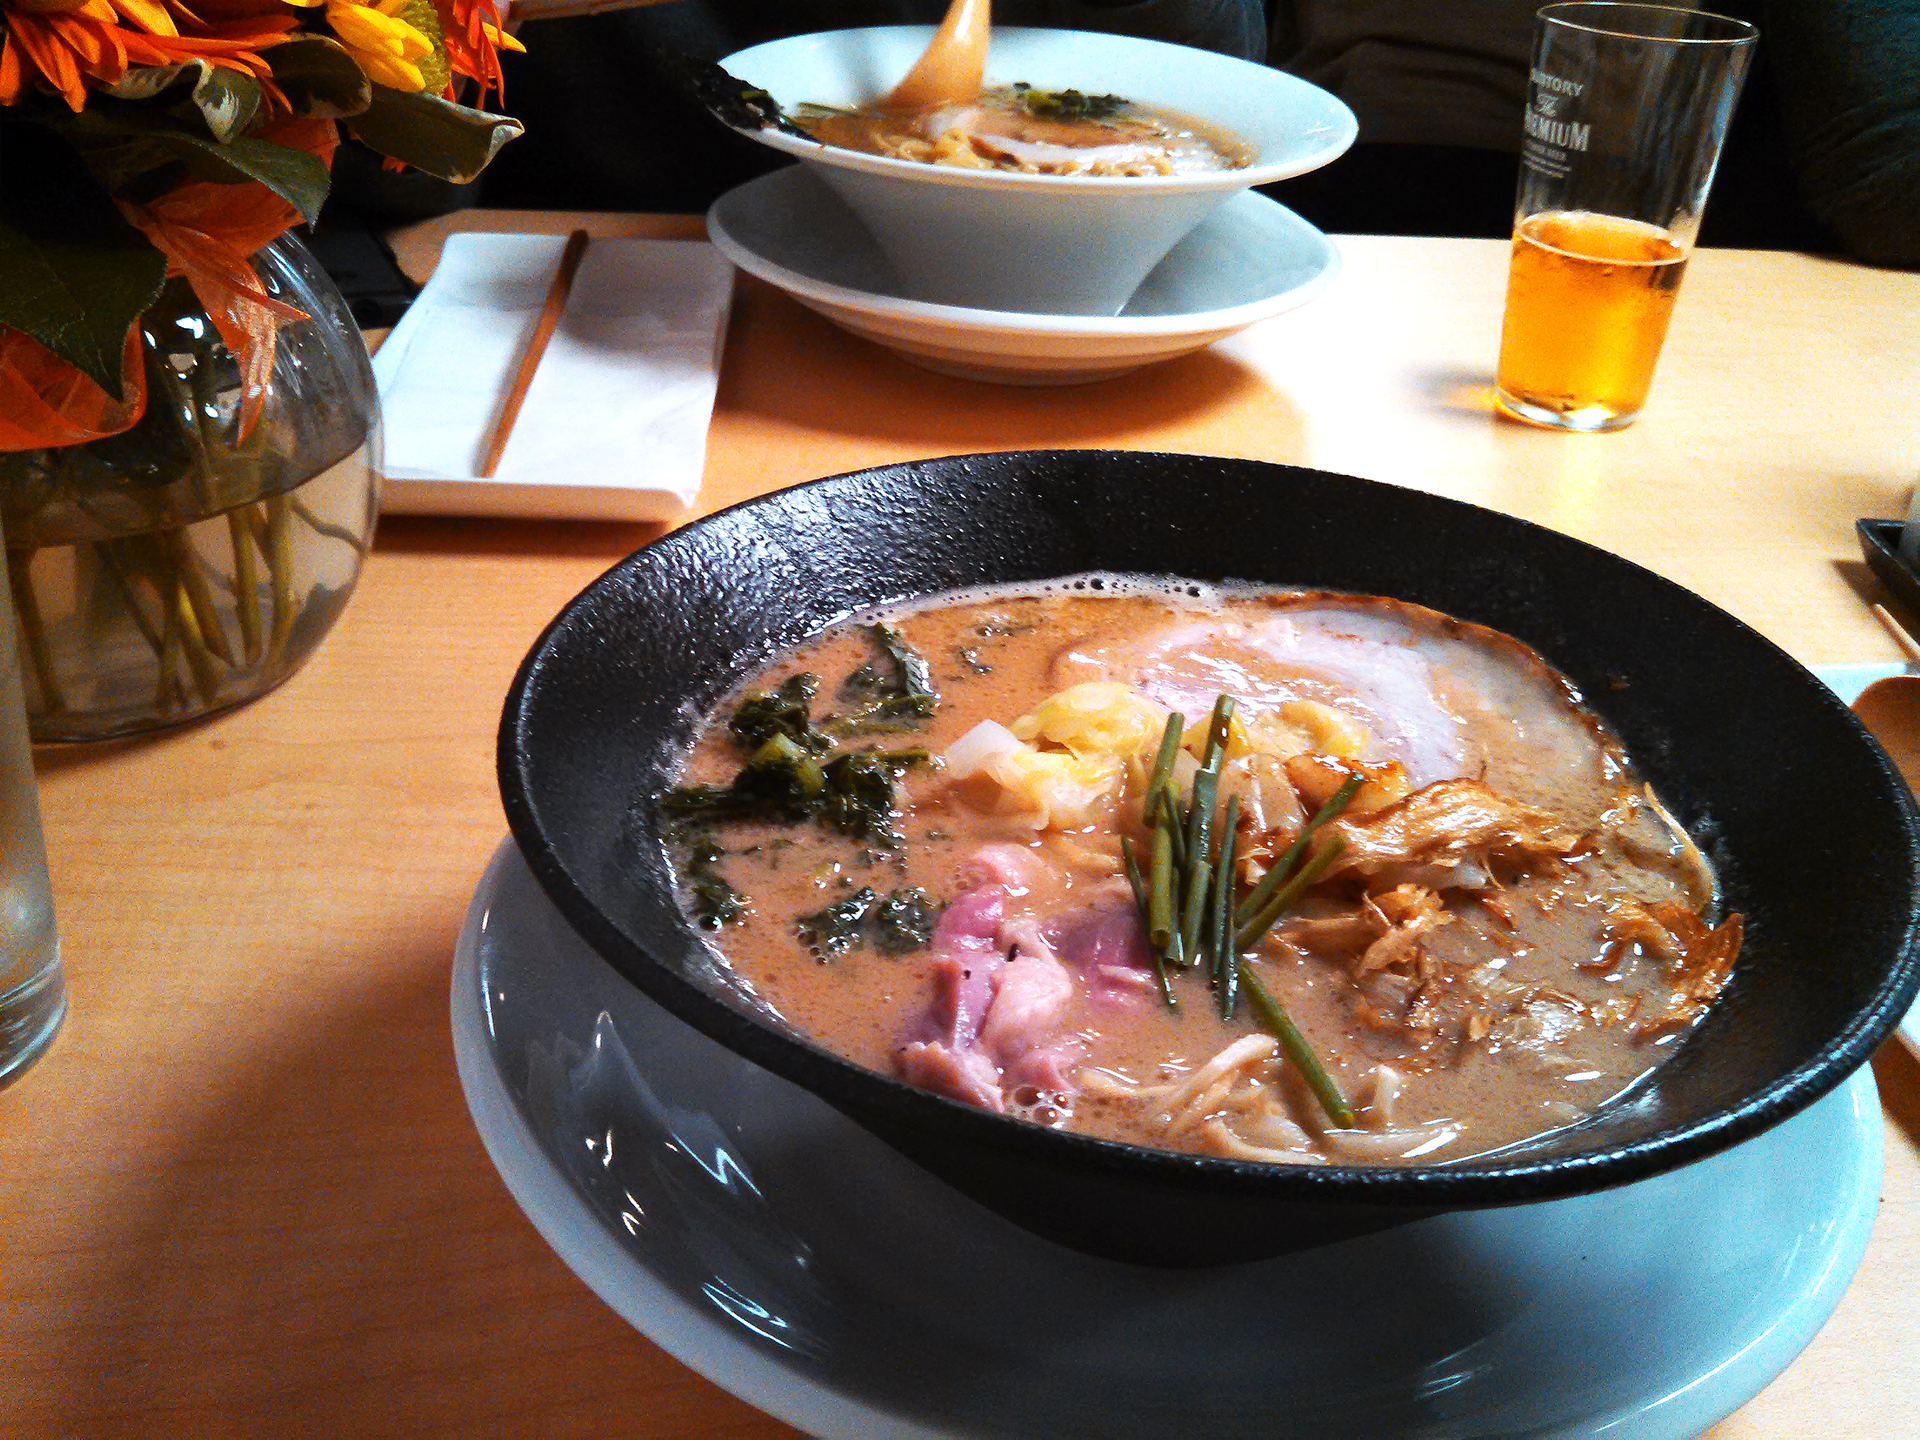 Tori paitan ramen with pork and duck.